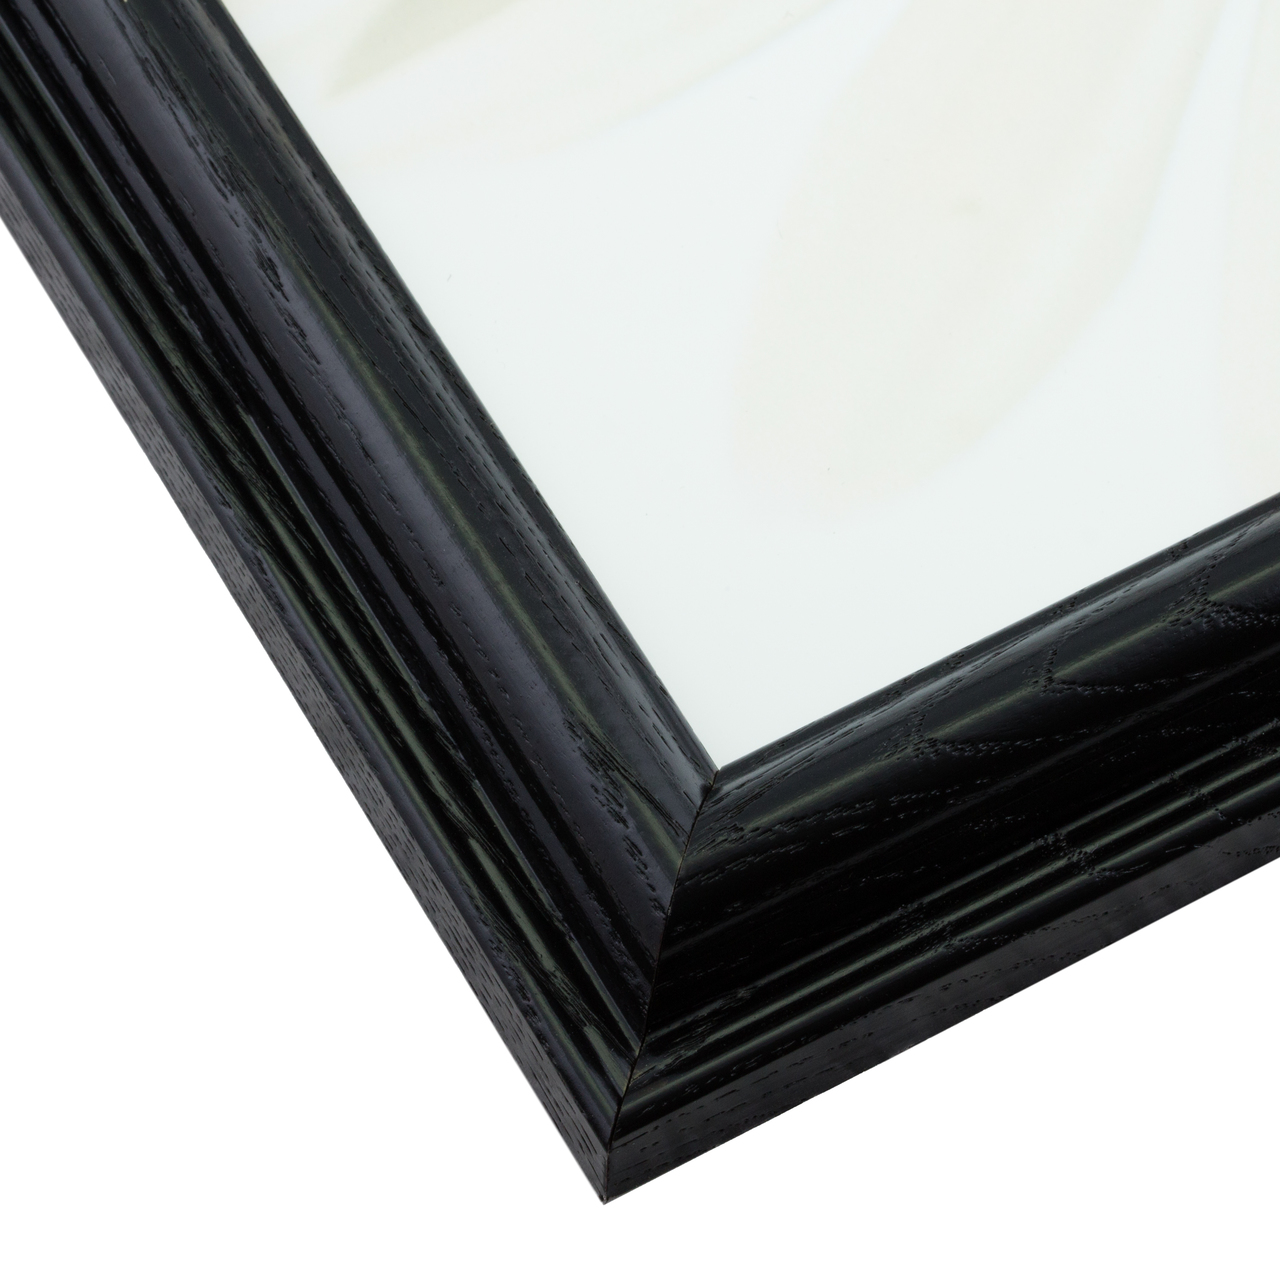 Craig Frames 20x24 Inch Whitewashed Wood Picture Frame Wiltshire 130 130ASHWW2024